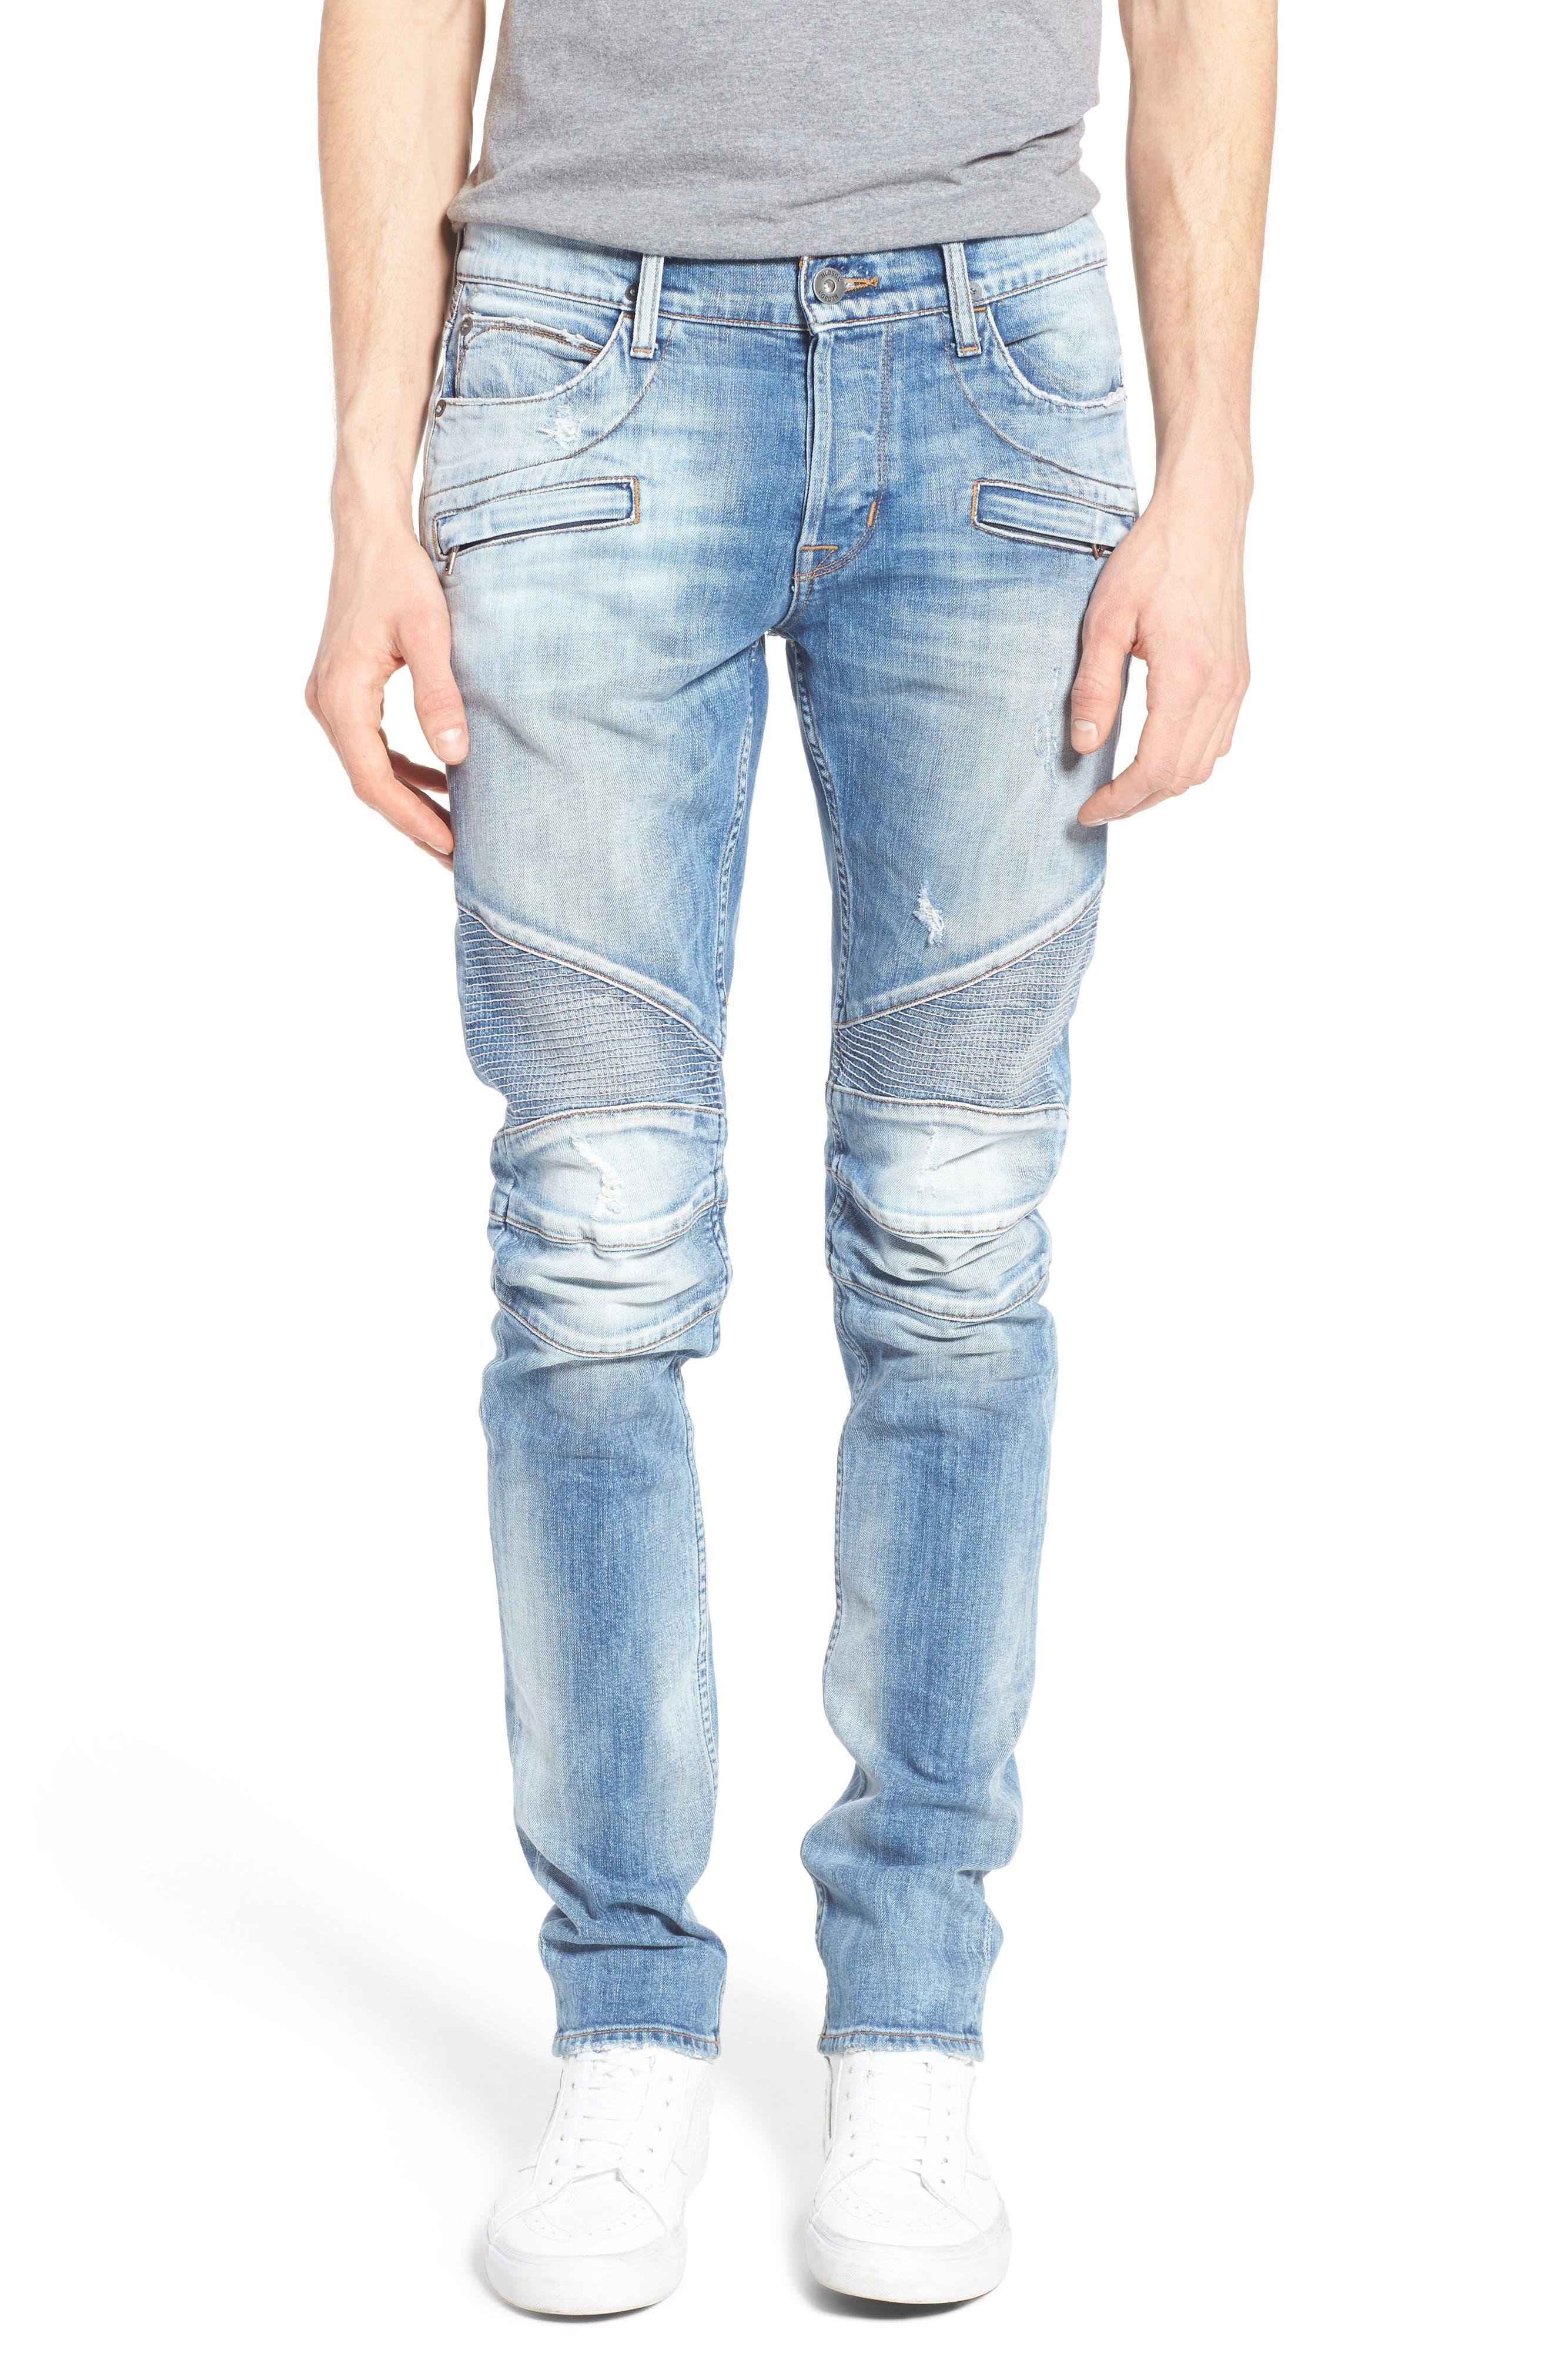 Blinder Skinny Fit Moto Jeans,                             Main thumbnail 1, color,                             429